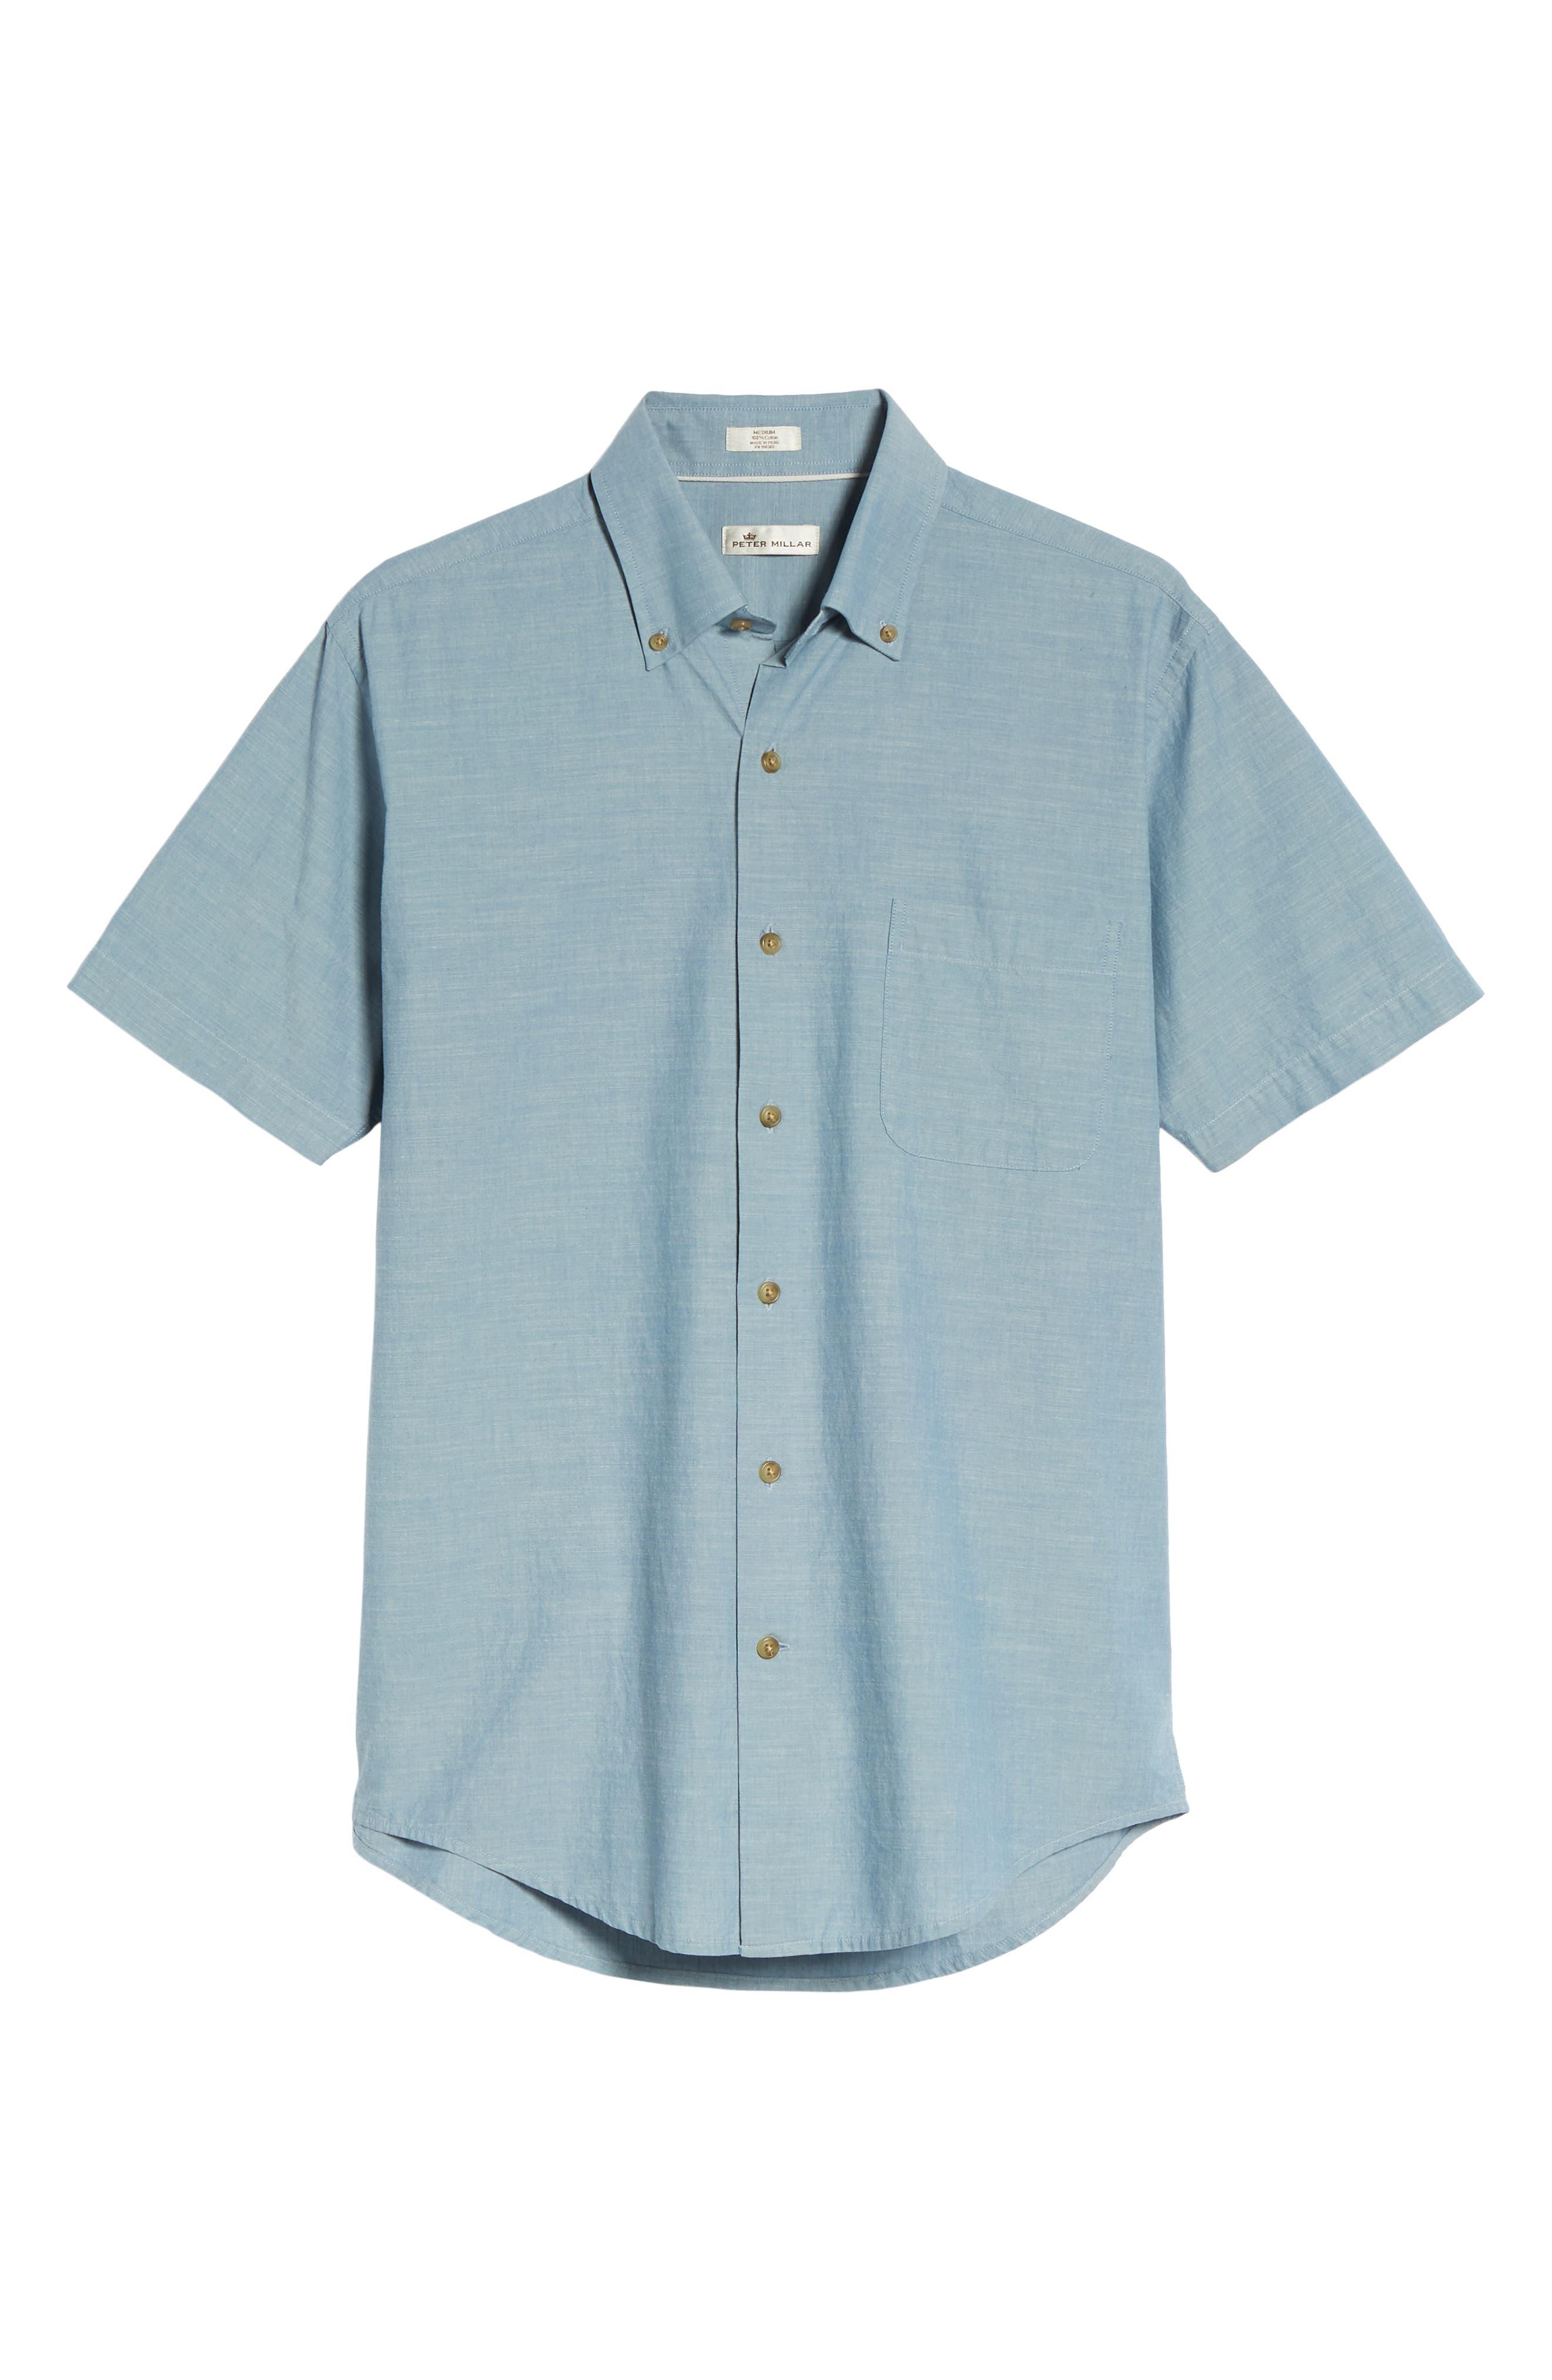 Heritage Chambray Sport Shirt,                             Alternate thumbnail 6, color,                             TAR HEEL BLUE